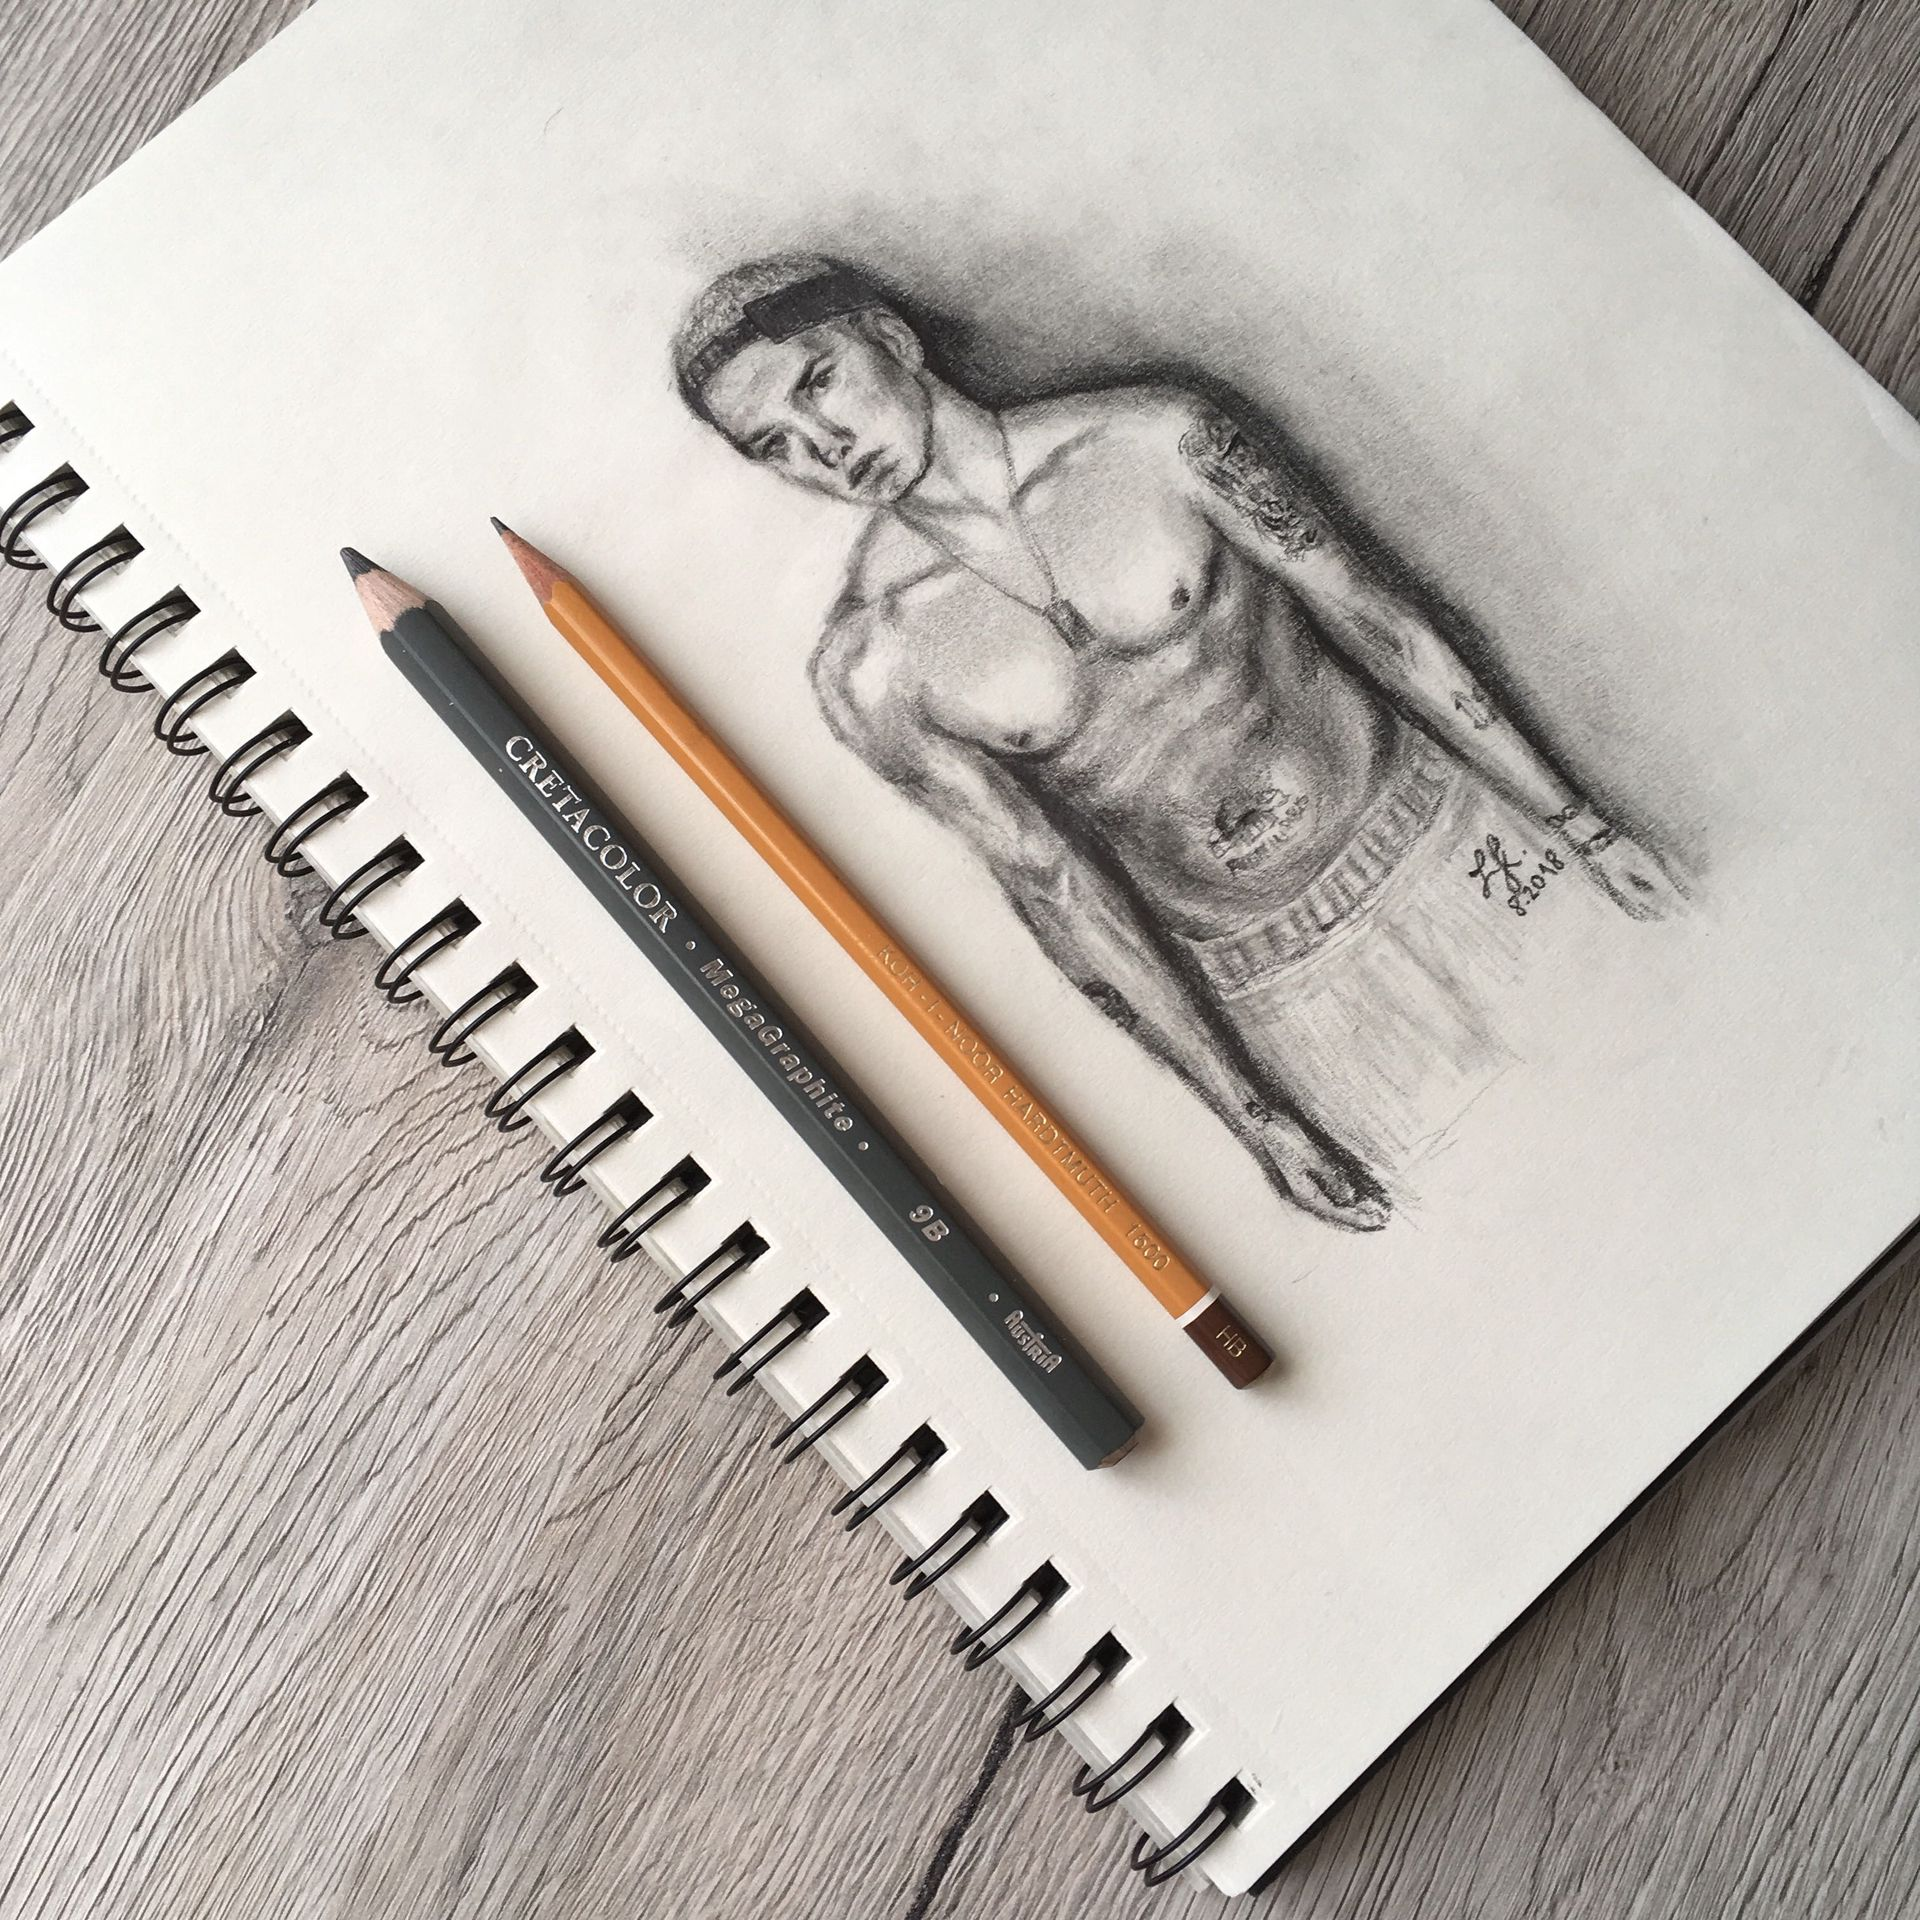 Moje Kresby Eminem Trochu Inak Wattpad